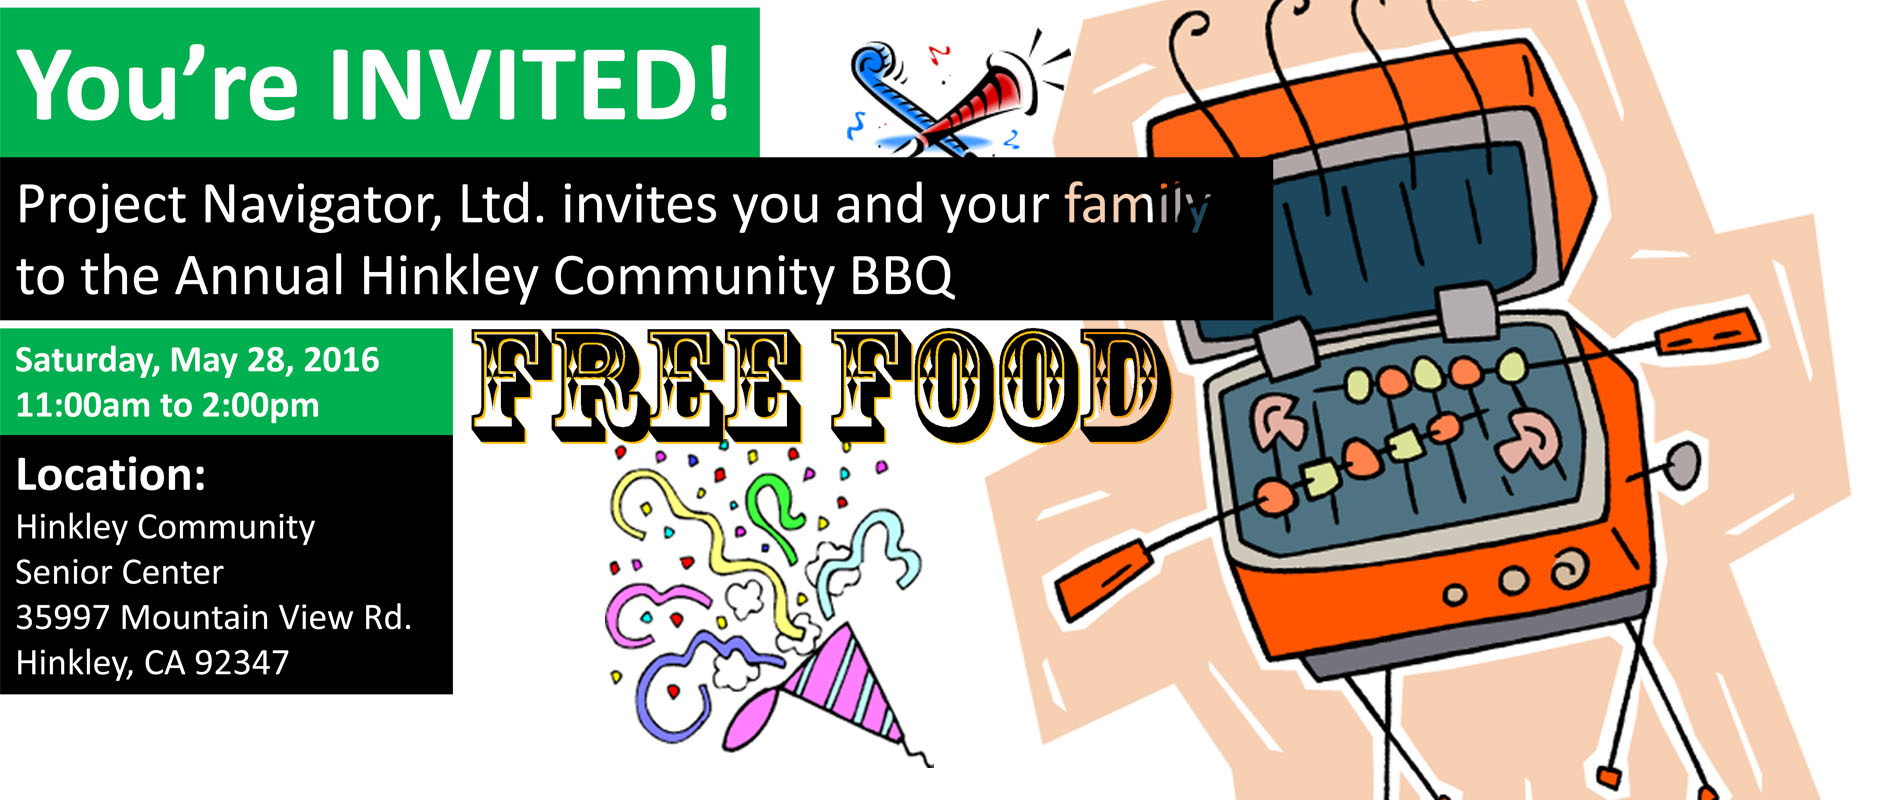 Annual Hinkley Community BBQ